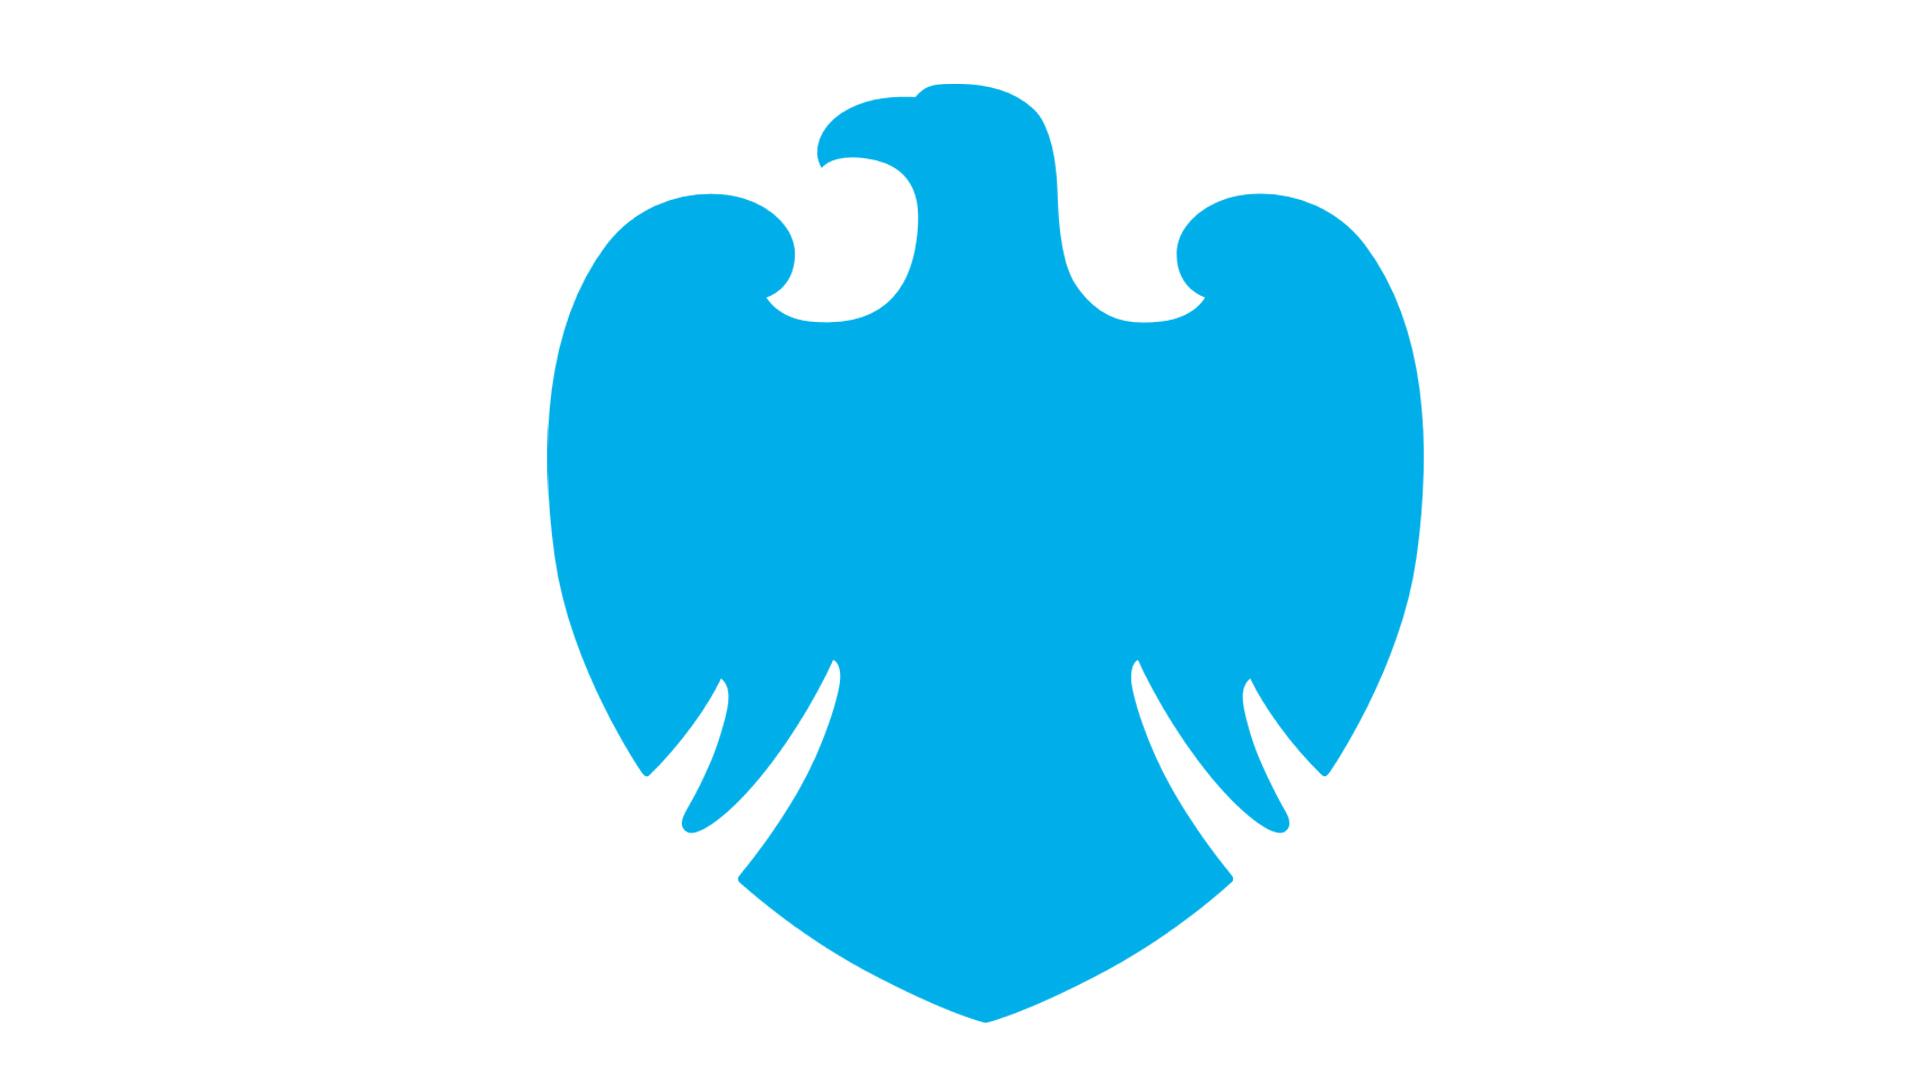 Barclays takes stake in SME lender MarketInvoice.